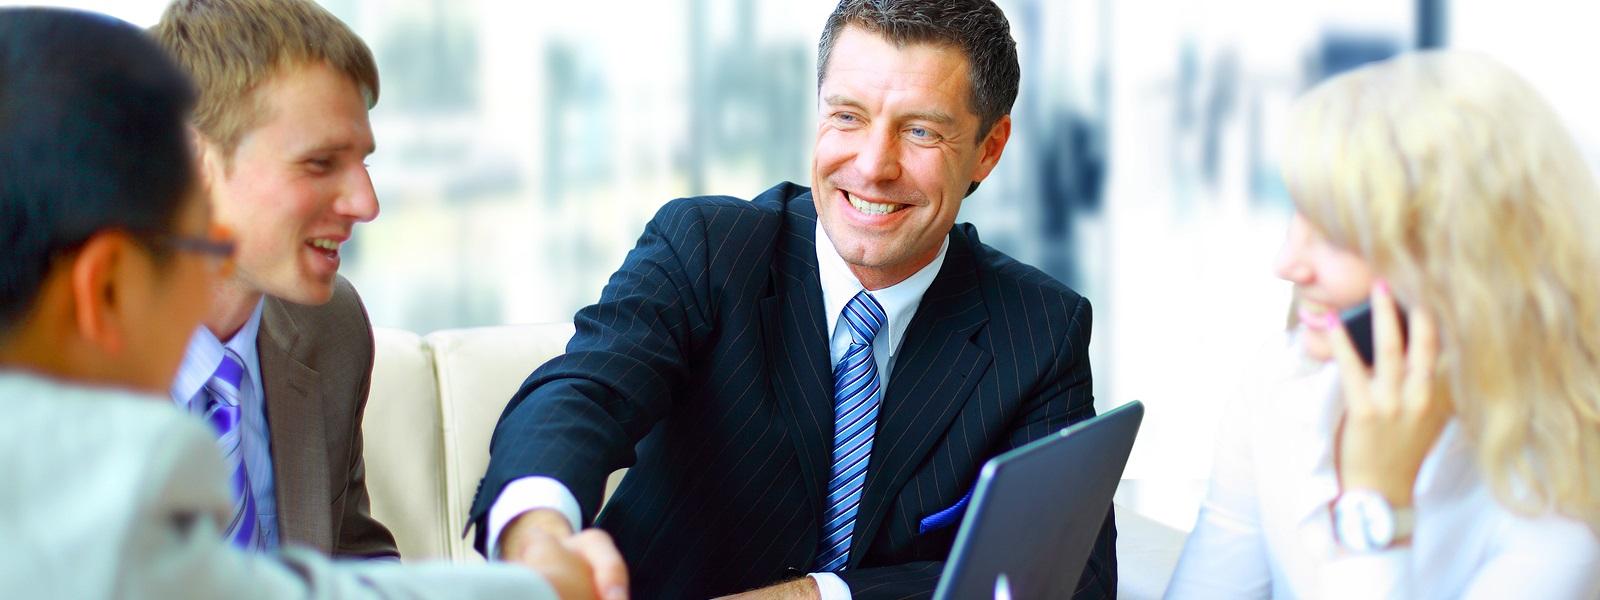 Professional Tax Advisors